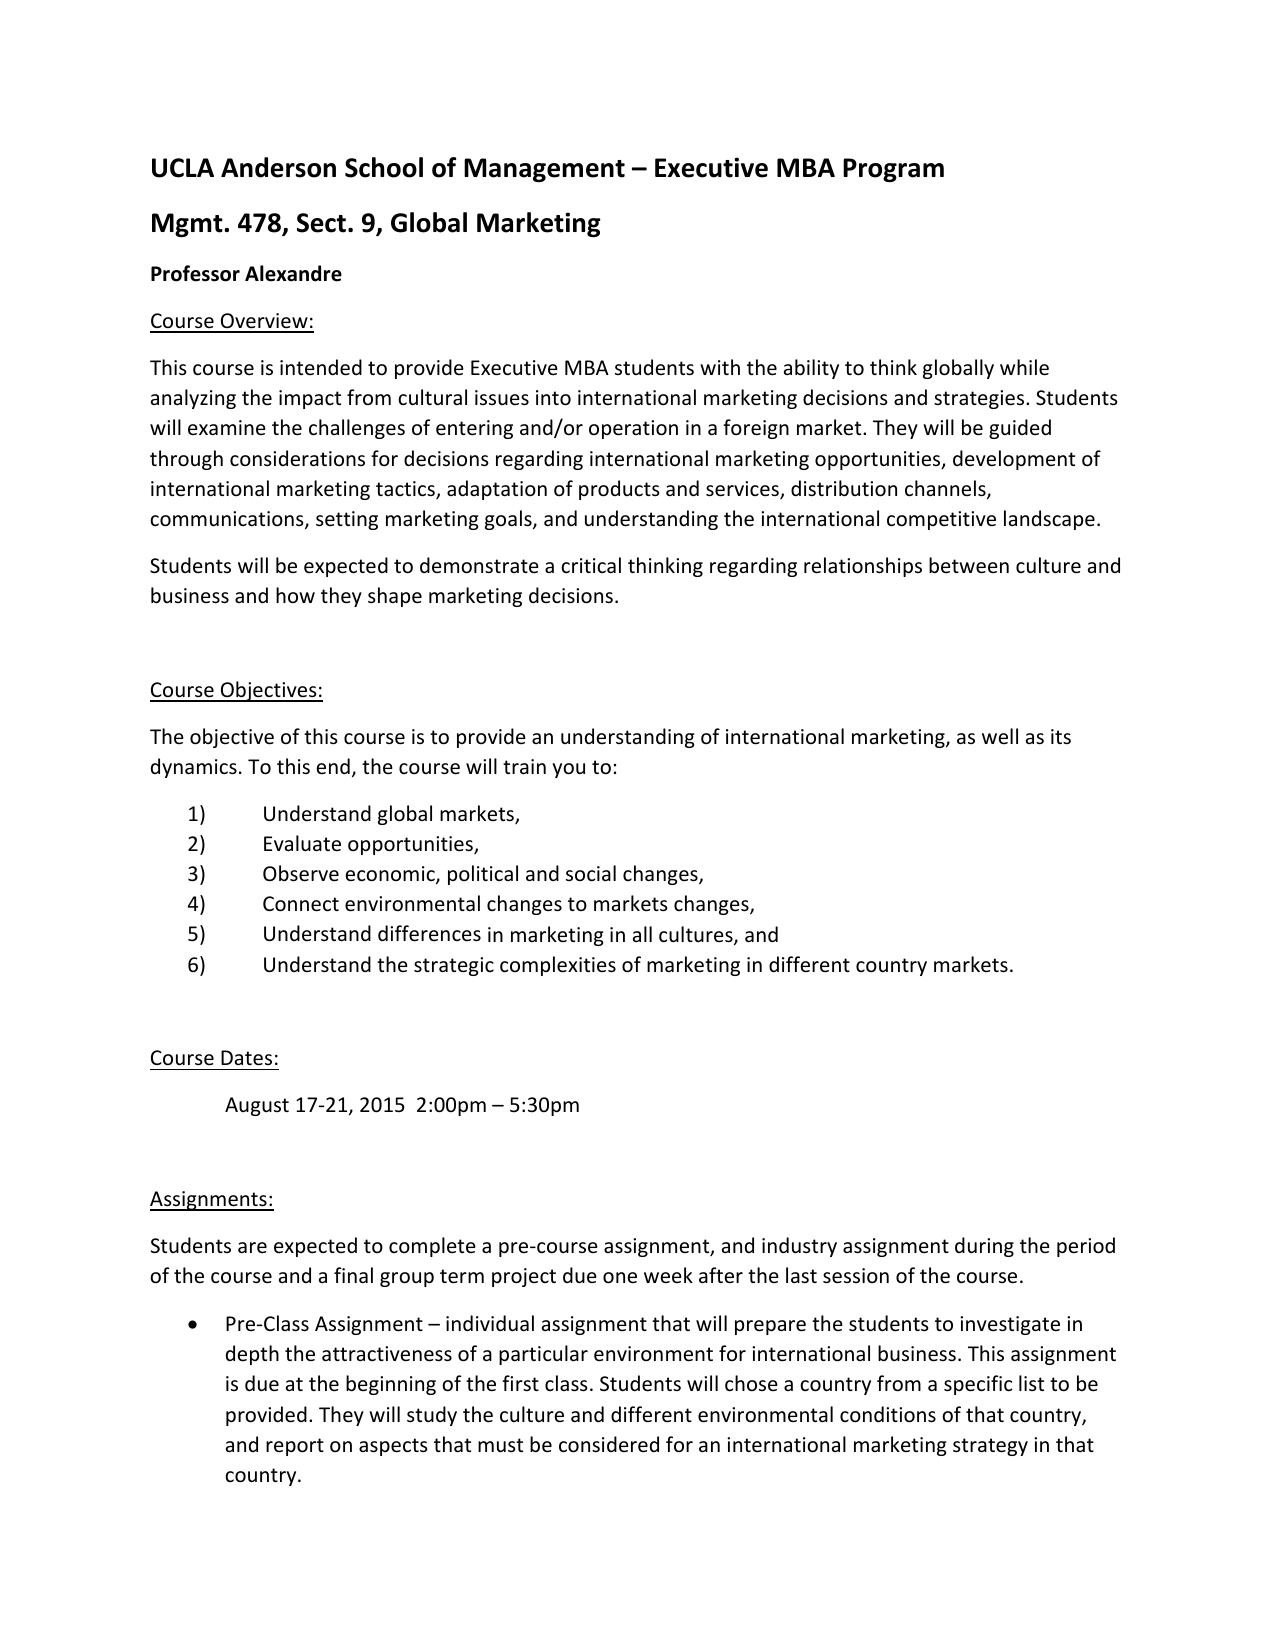 tasp application essays for nursing formal letter essay about environment